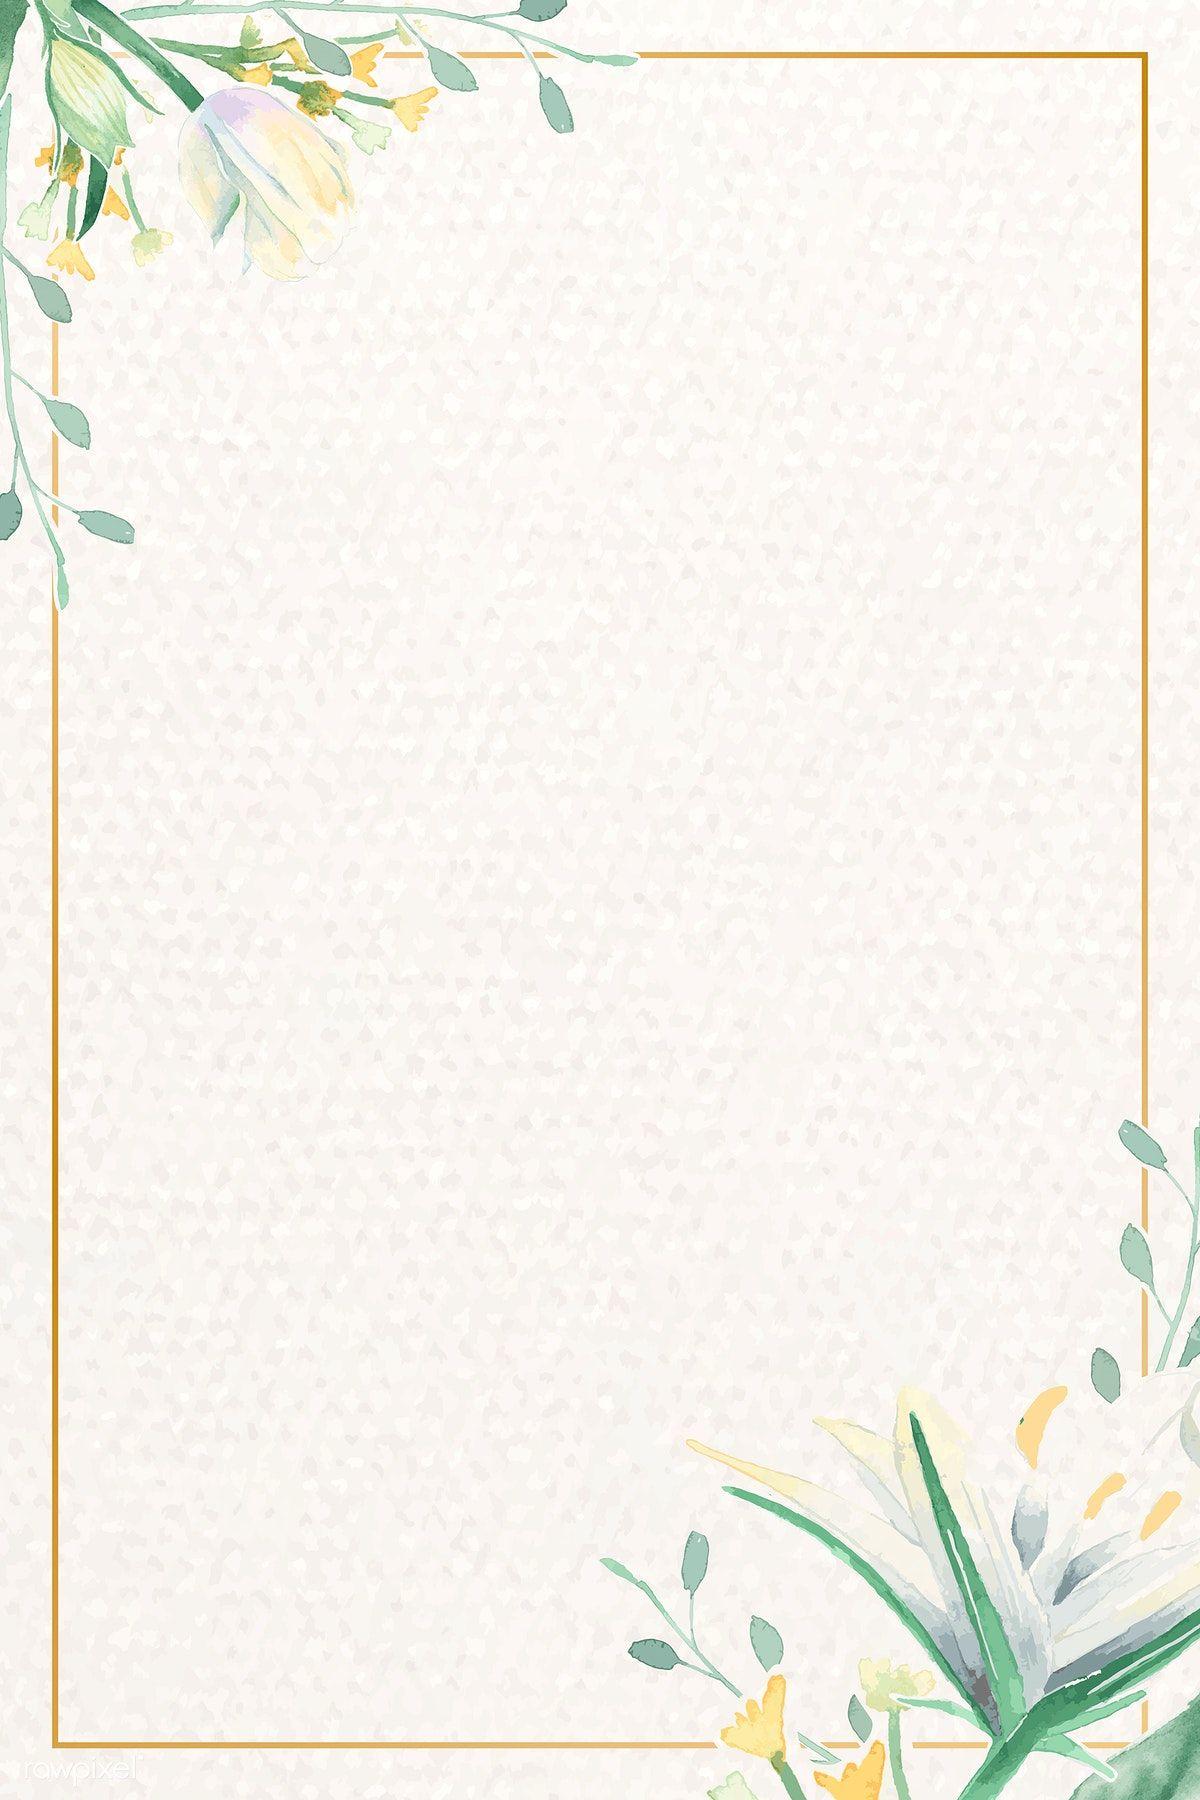 Download Premium Vector Of Vintage Watercolor Floral Card Template